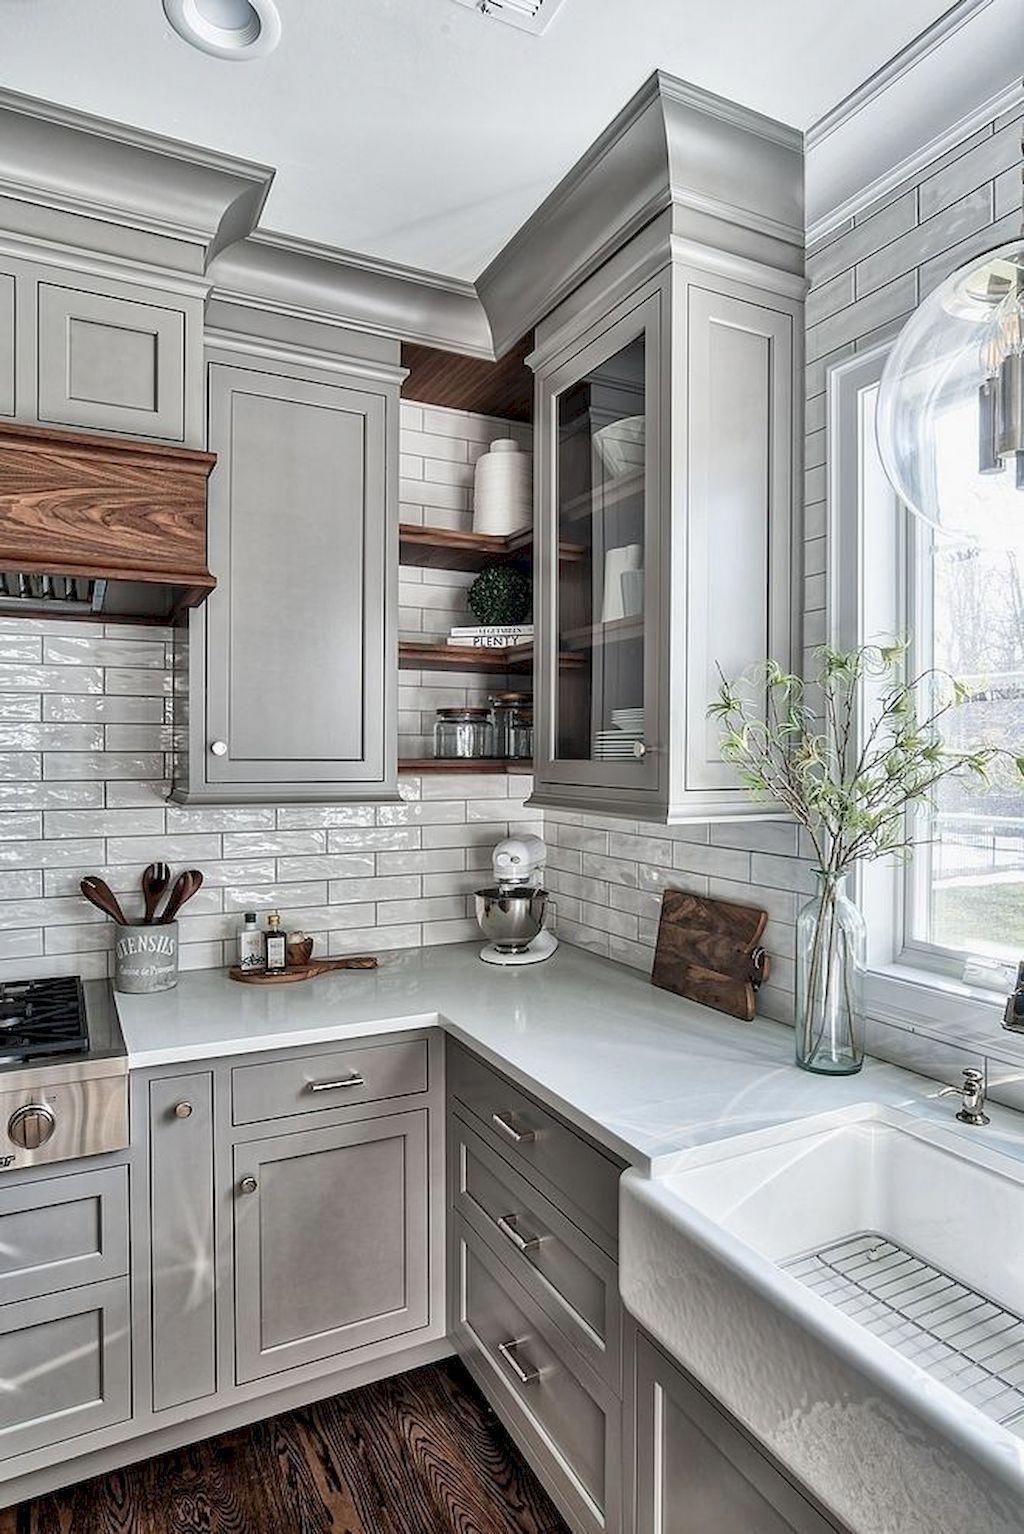 Bestkitchencabinetsdesignzone decorating kitchen home decor ideas paint easy also best simple designs for small house decoration rh pinterest